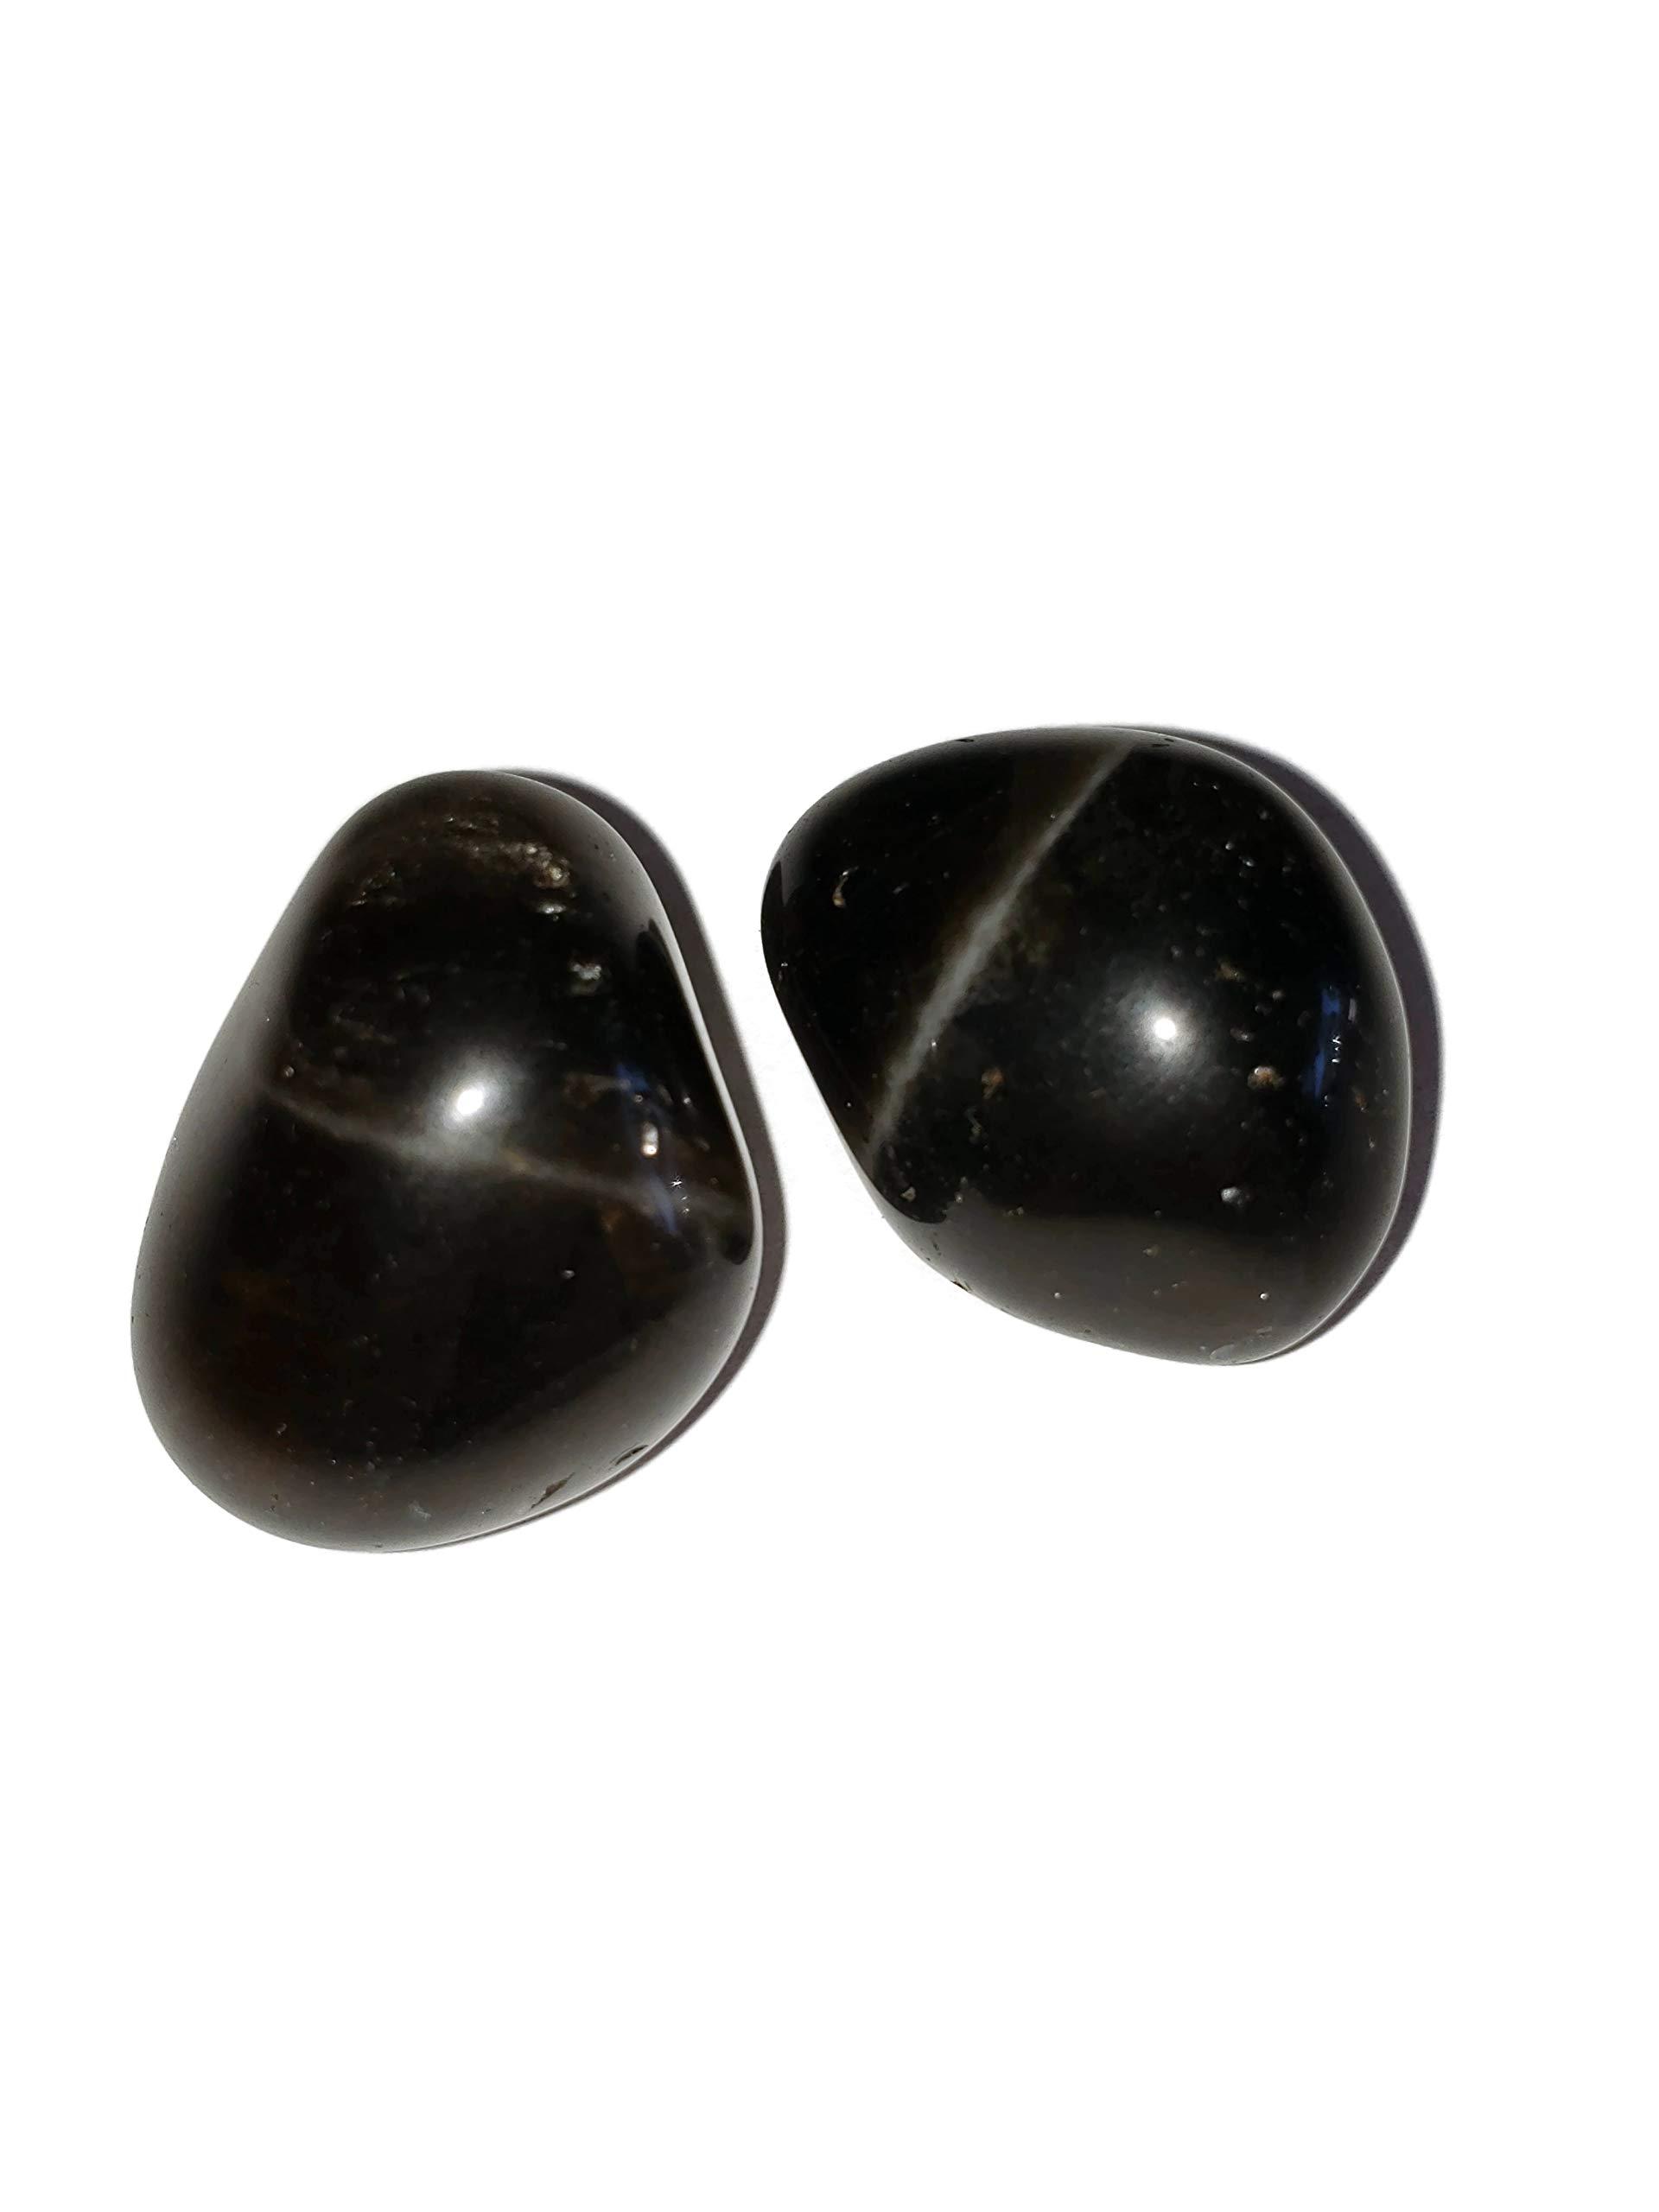 Rubellite Hand-Polished Natural Healing Crystal Gemstone Specimens from Brazil 1pc Medium Pink Tourmaline AA-Grade Aka